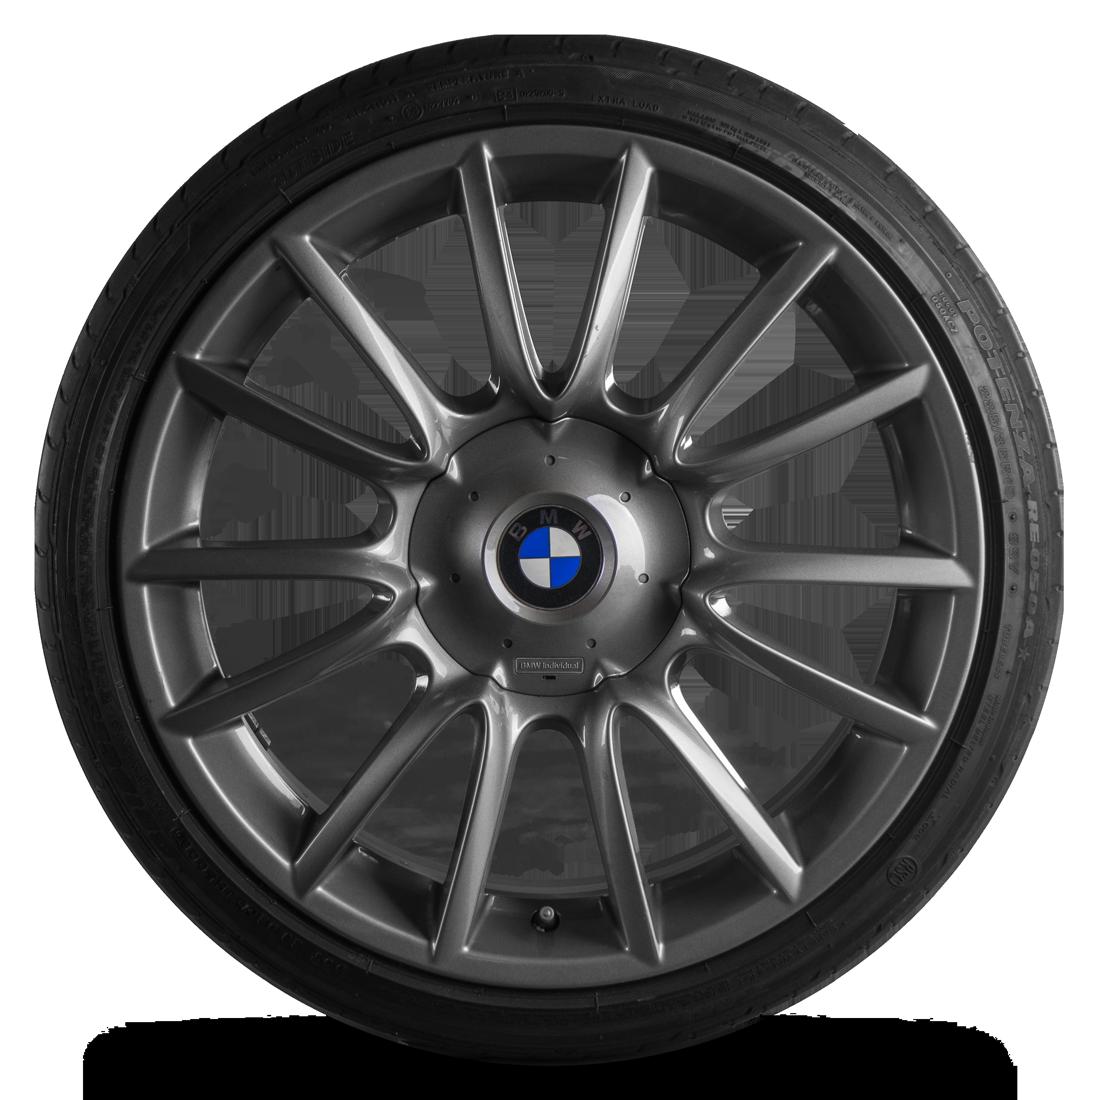 BMW 19 Zoll Felgen 3er E90 E91 E92 E93 Alufelgen Sommerreifen Individual 228